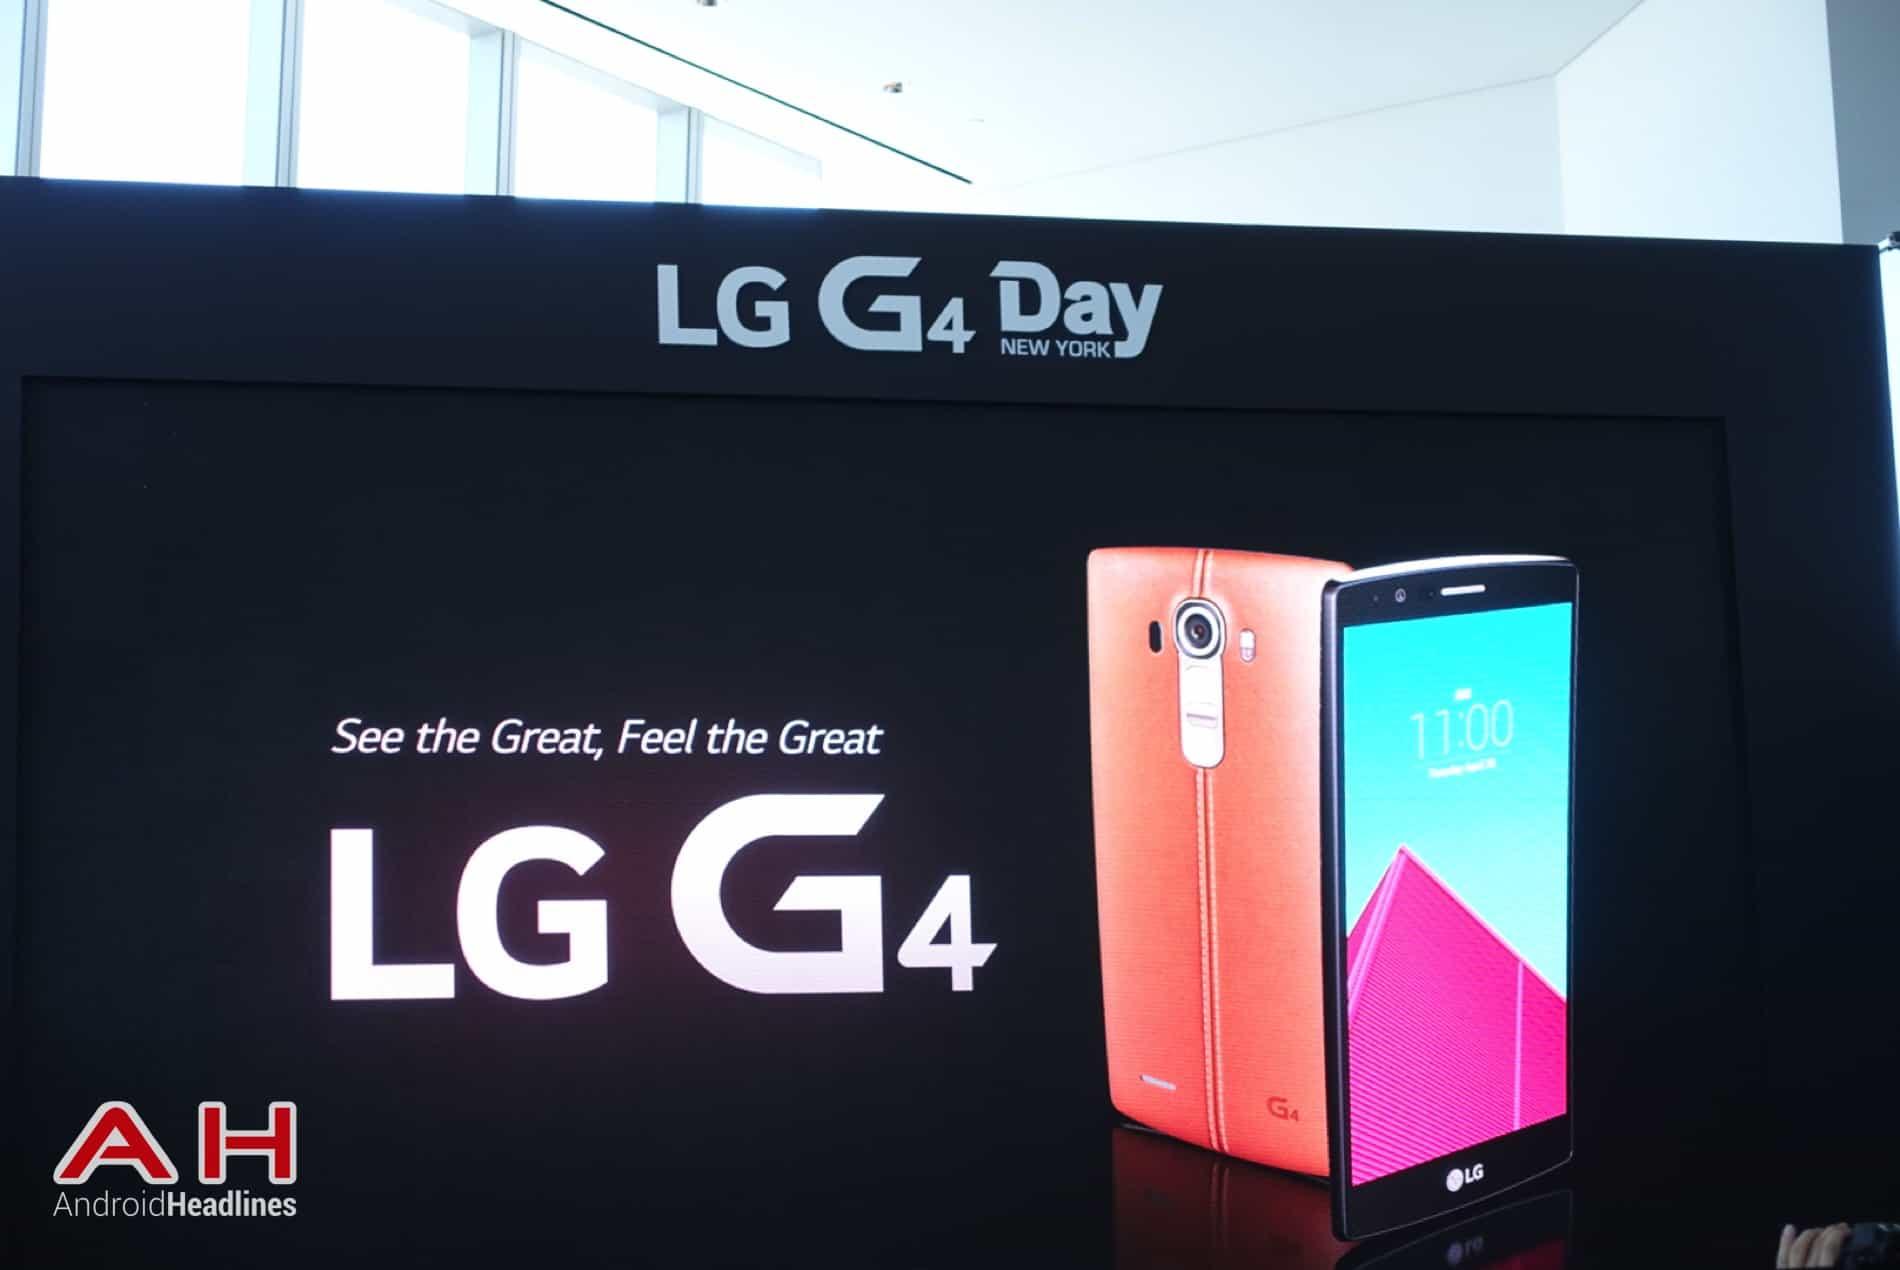 LG G4 Day AH 02 13